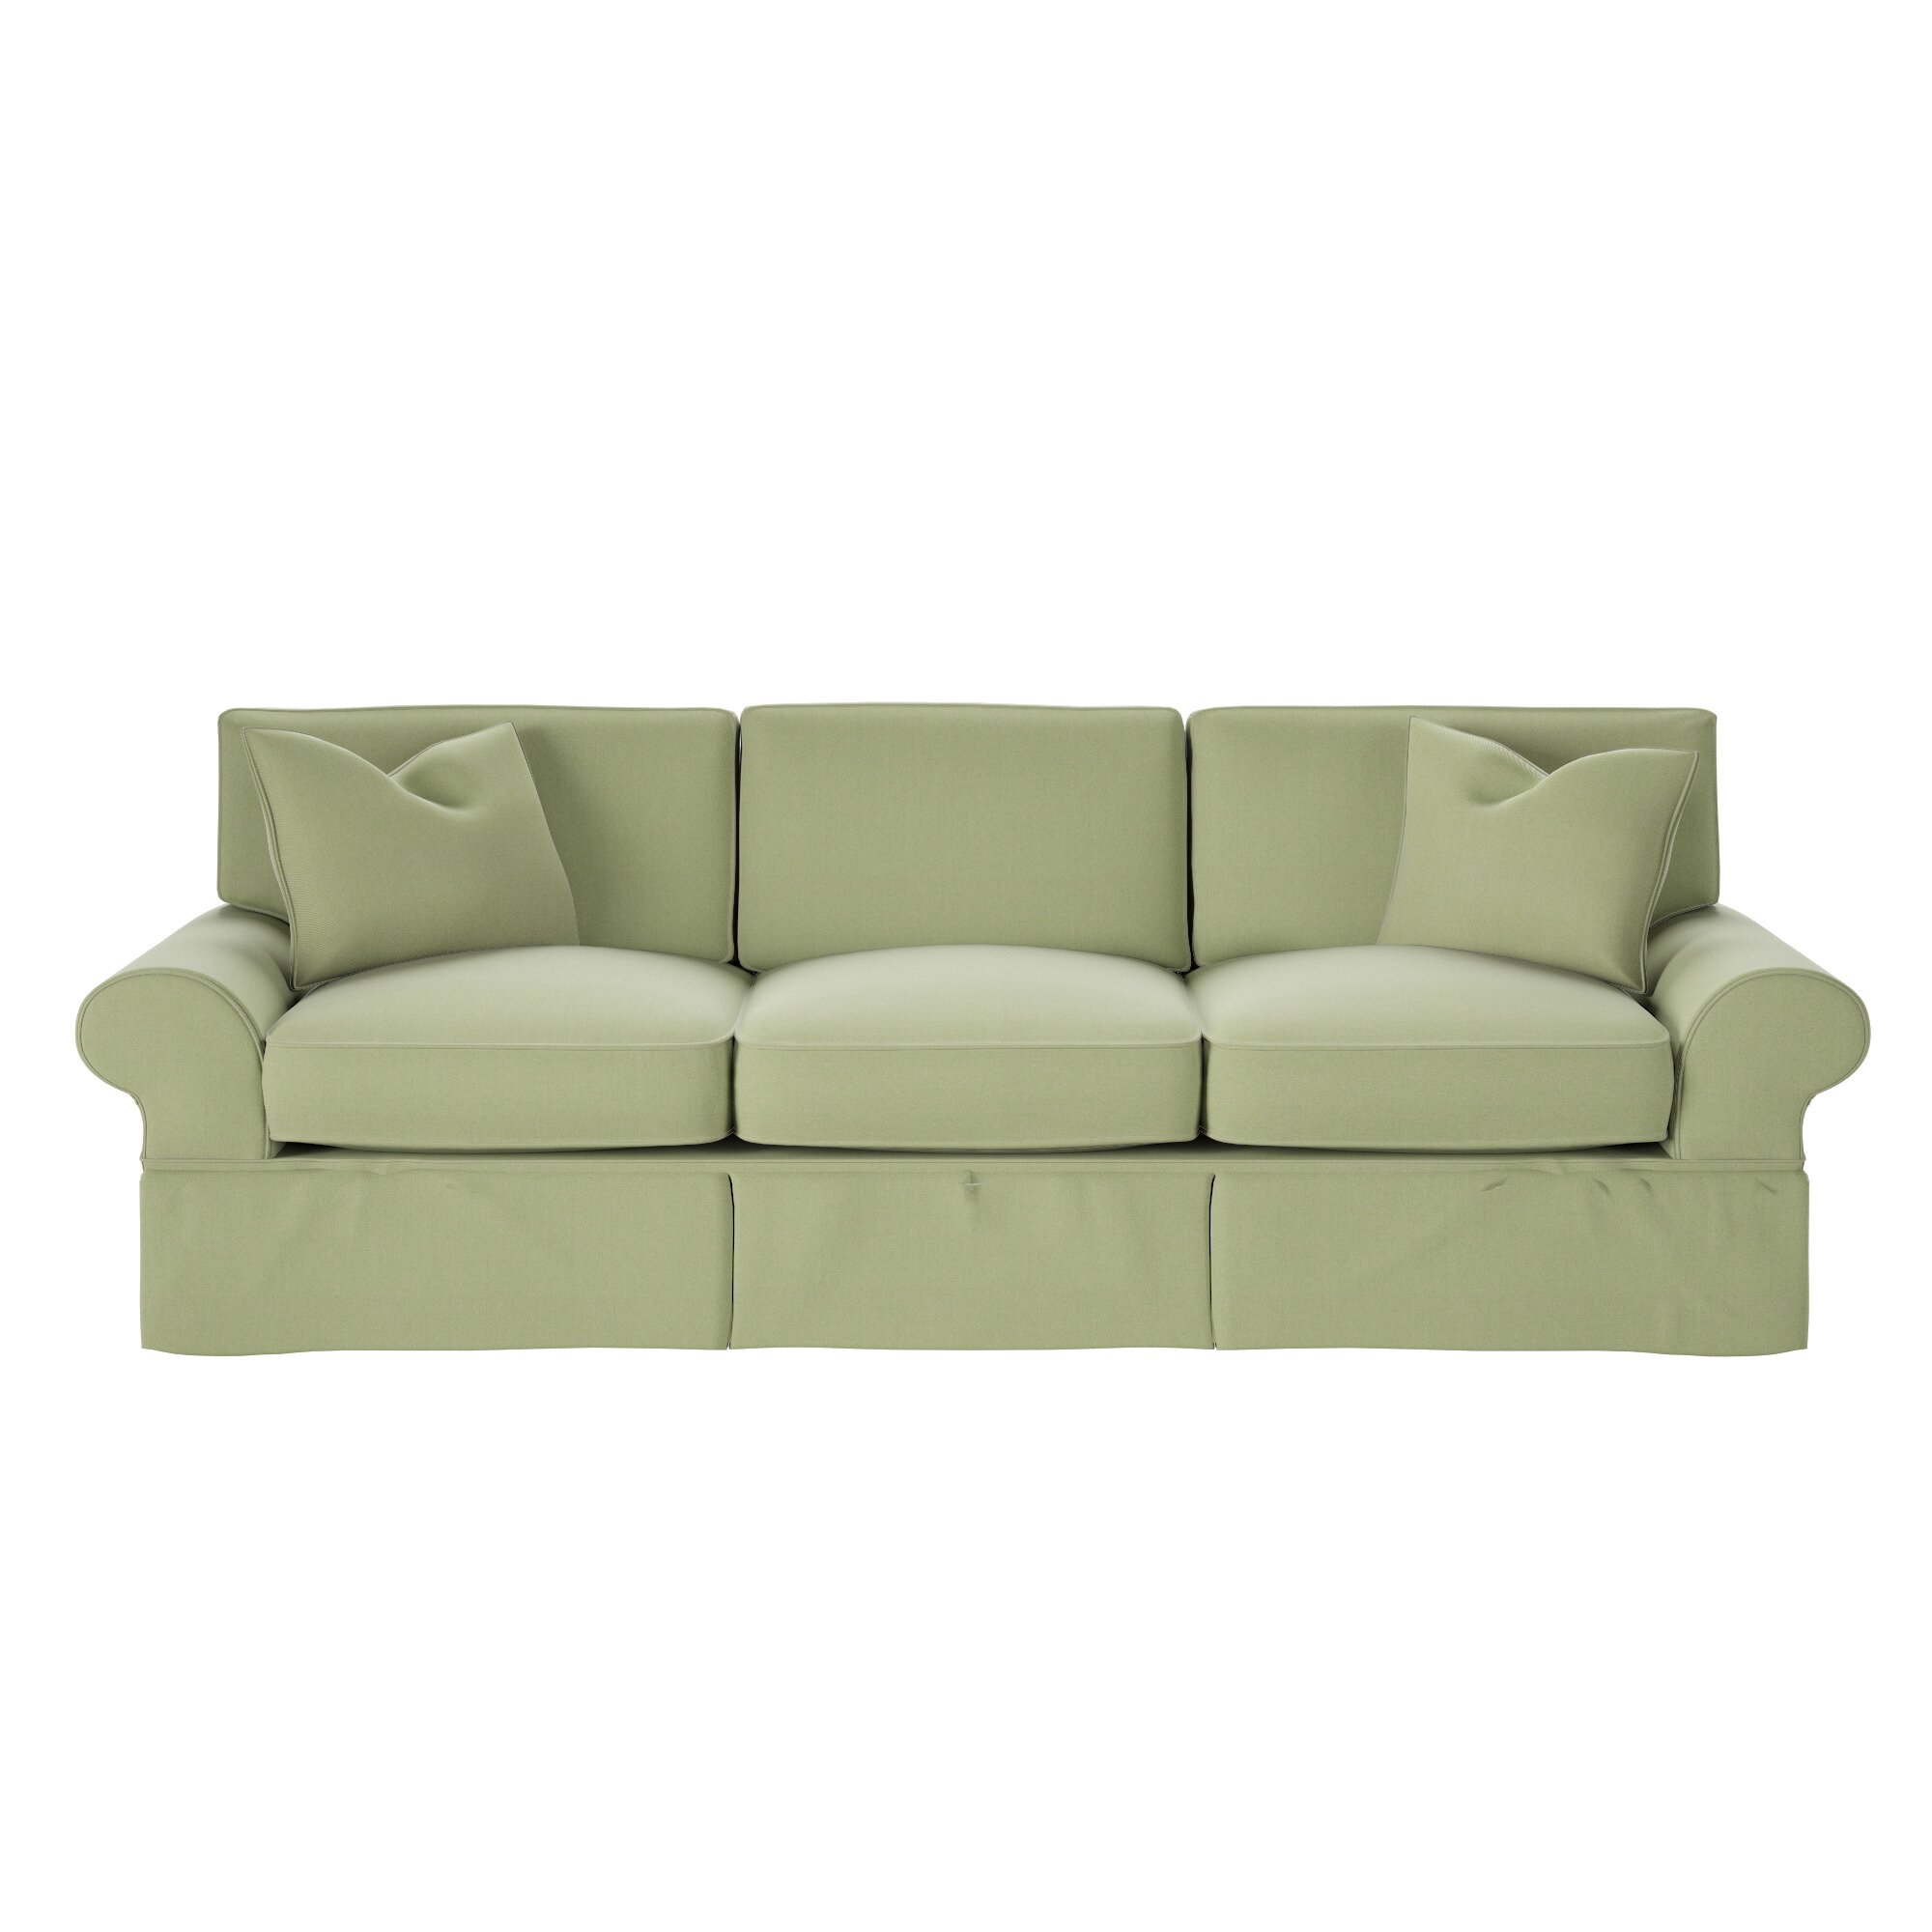 Wayfair custom upholstery casey sofa reviews wayfairca for White sectional sofa wayfair